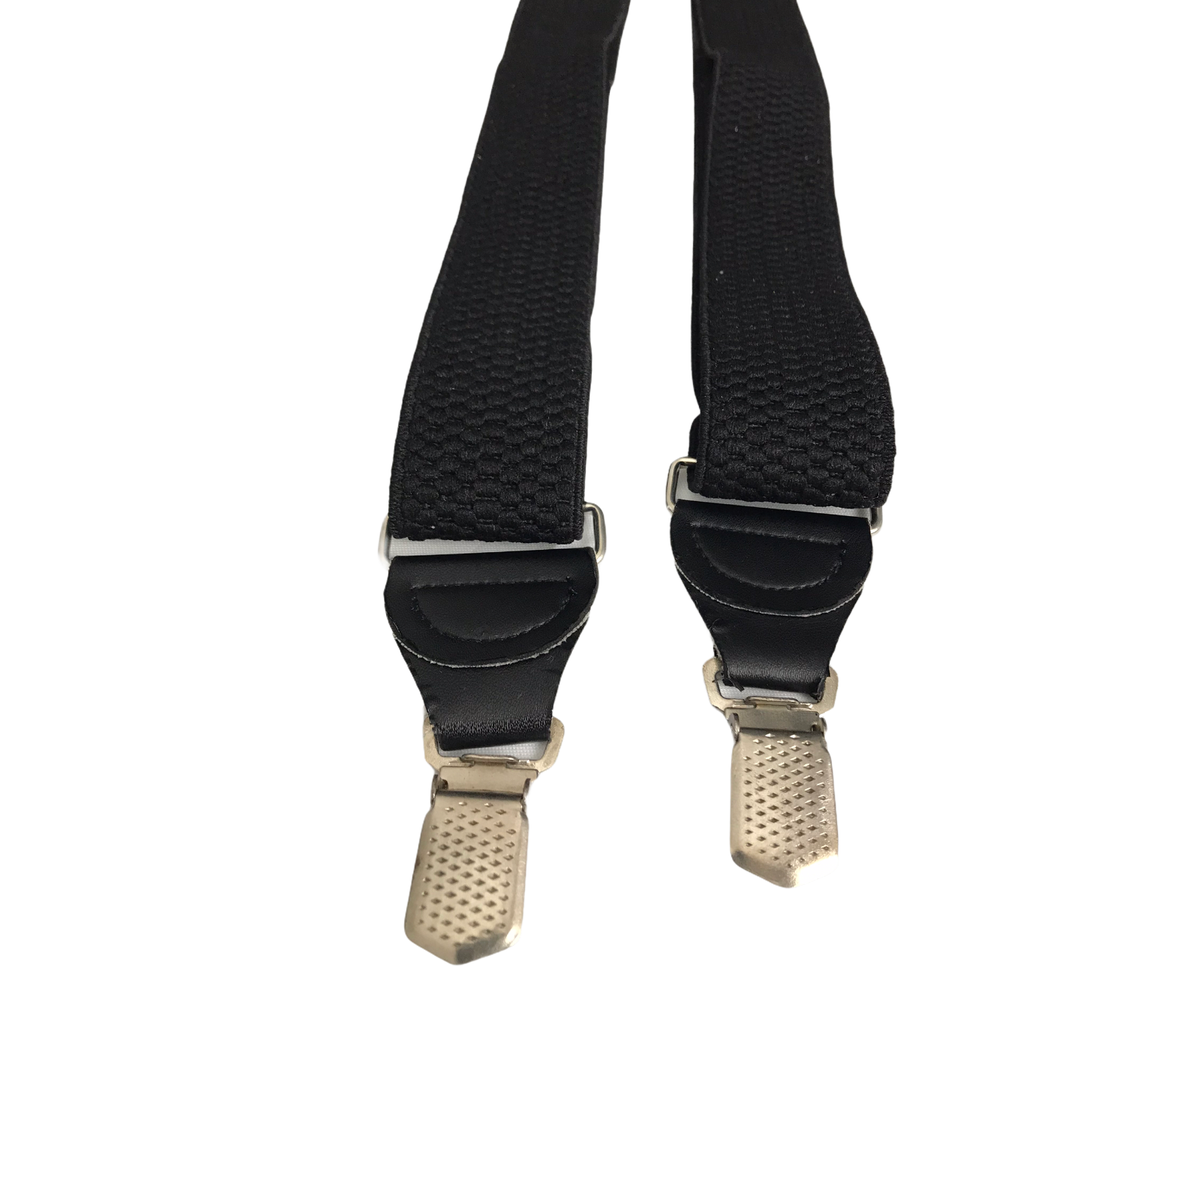 Men's Vintage Retro Black Chunky 3-Clip Adjustable Y-Shape Braces Suspenders